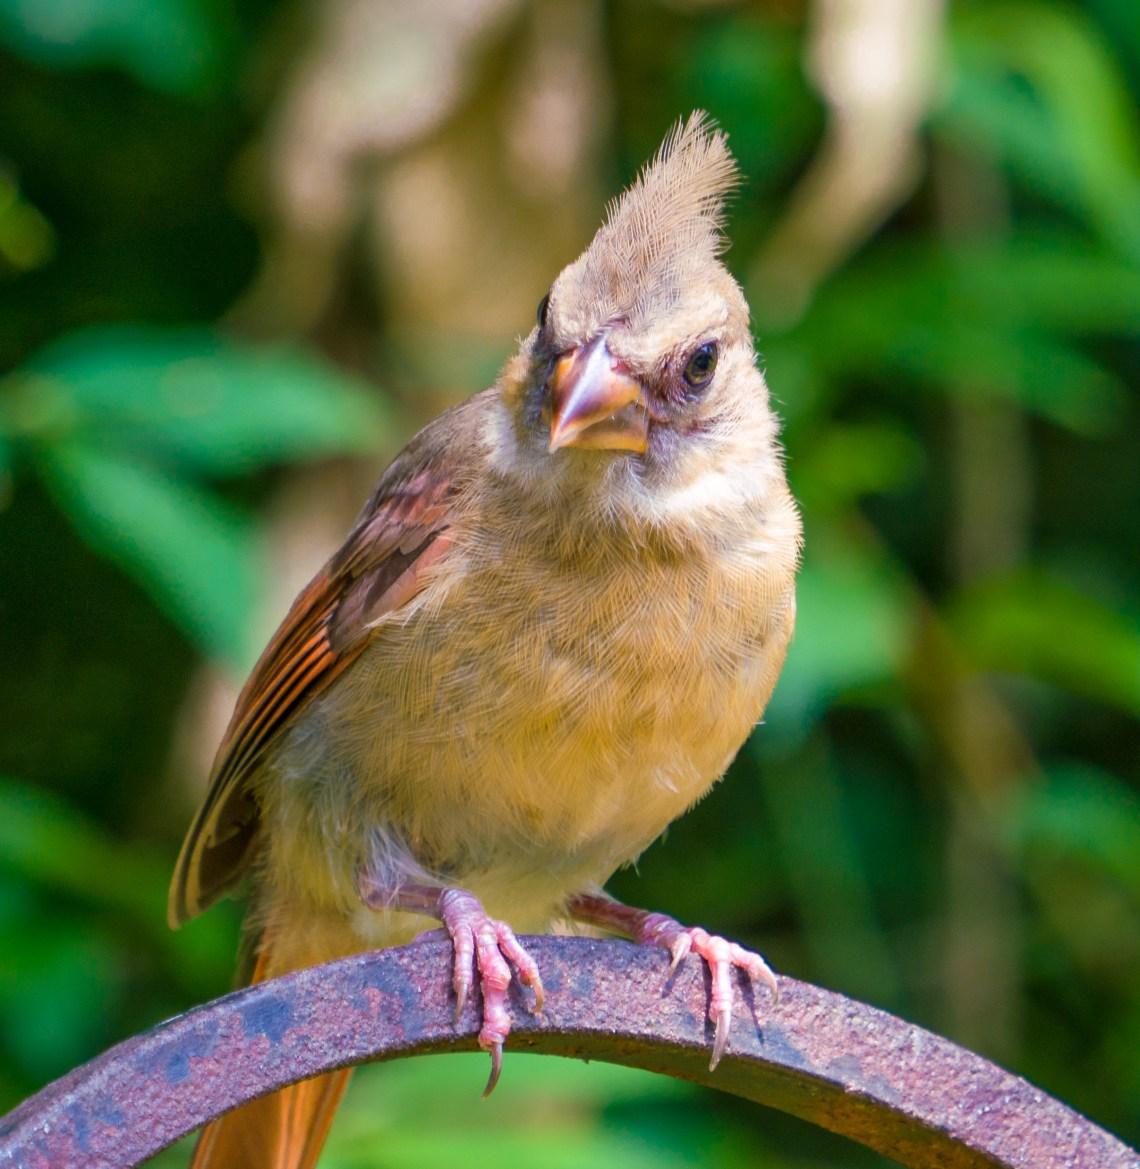 Golden plumages female Cardinal